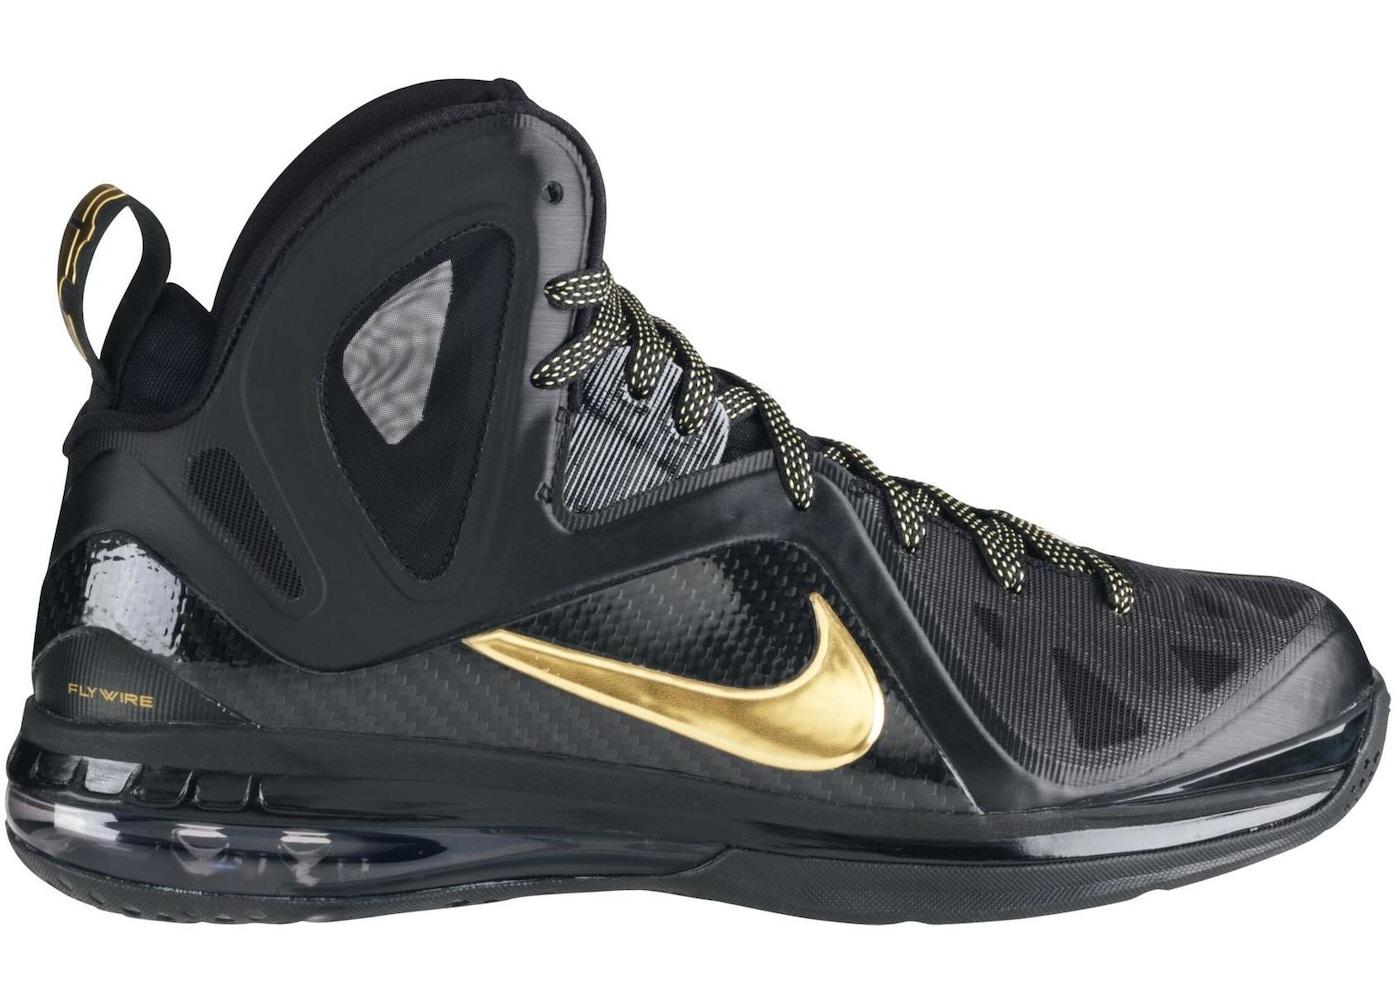 Nike LeBron 9 Shoes - Average Sale Price 6b2d78a314